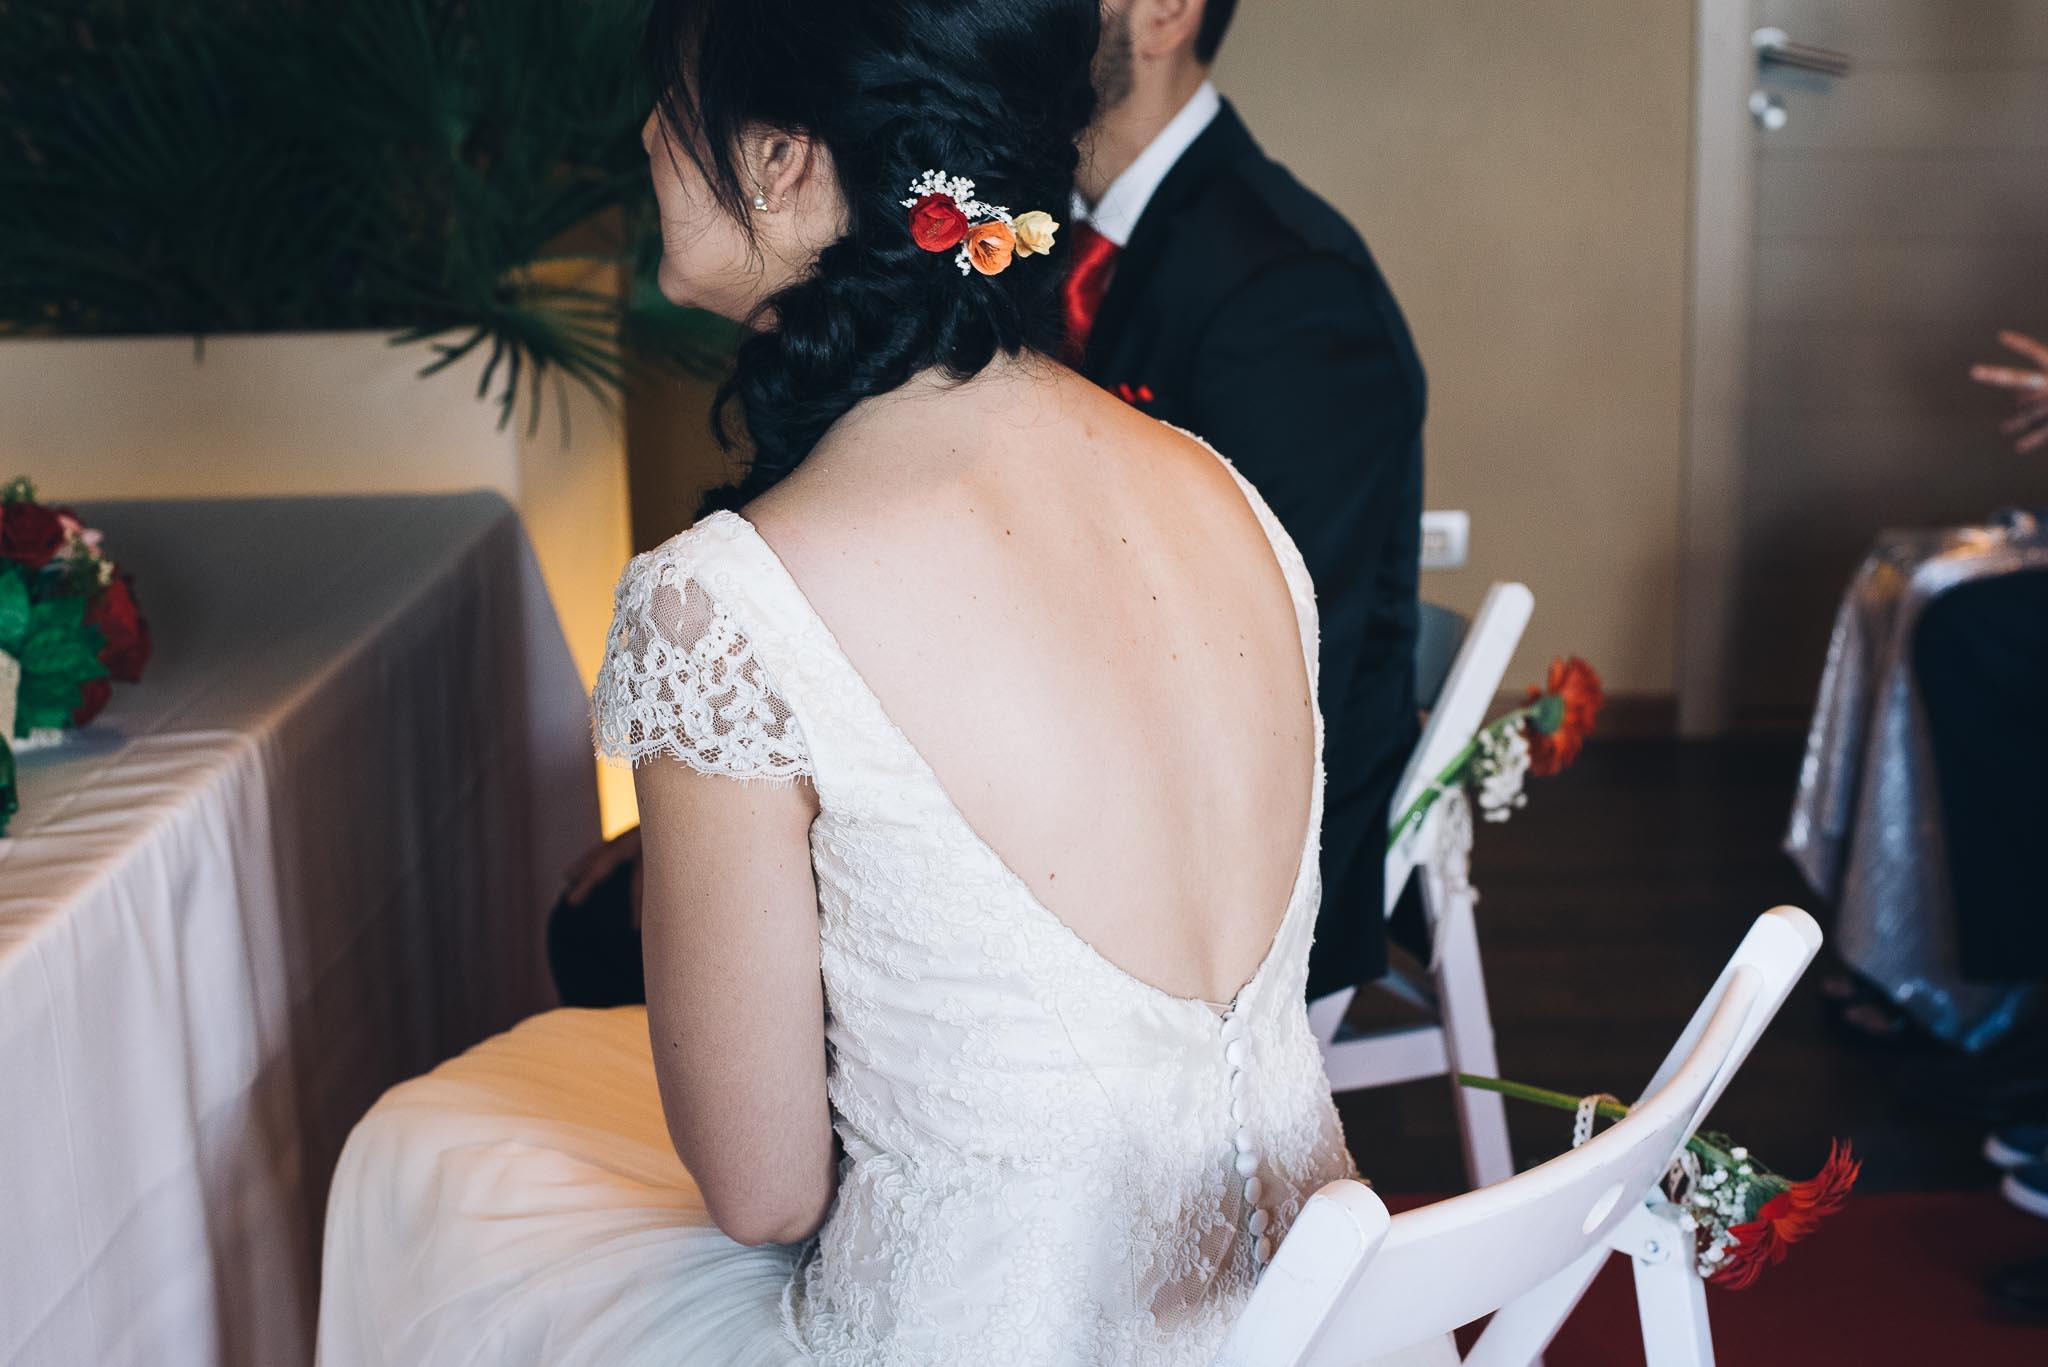 fotoperiodismo-laura-arroyo-fotografia-de-boda-hotel-qgat-san-cugat-barcelona-35